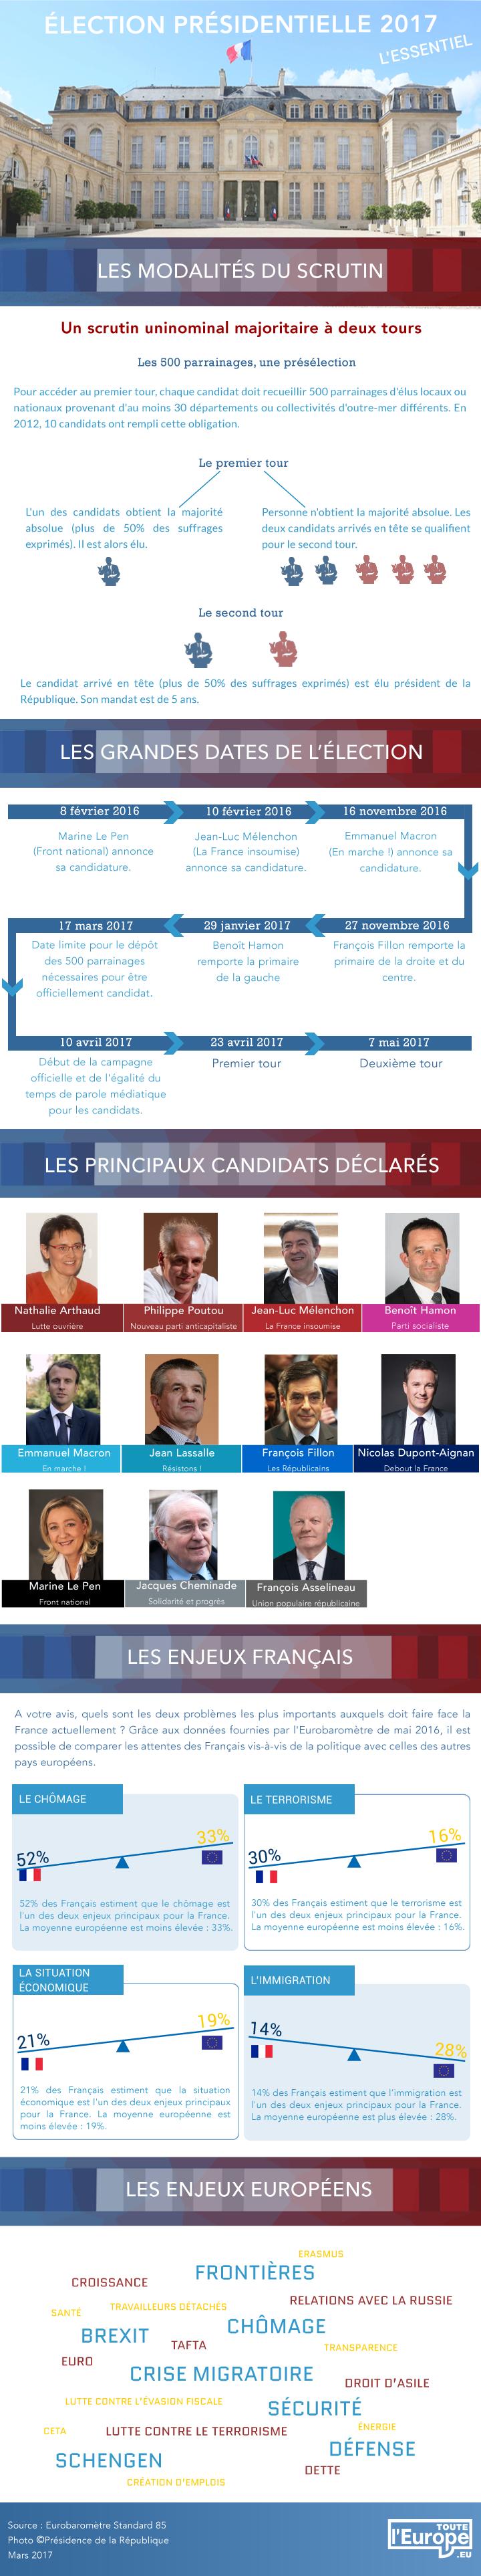 Datavisualisation Election présidentielle 2017